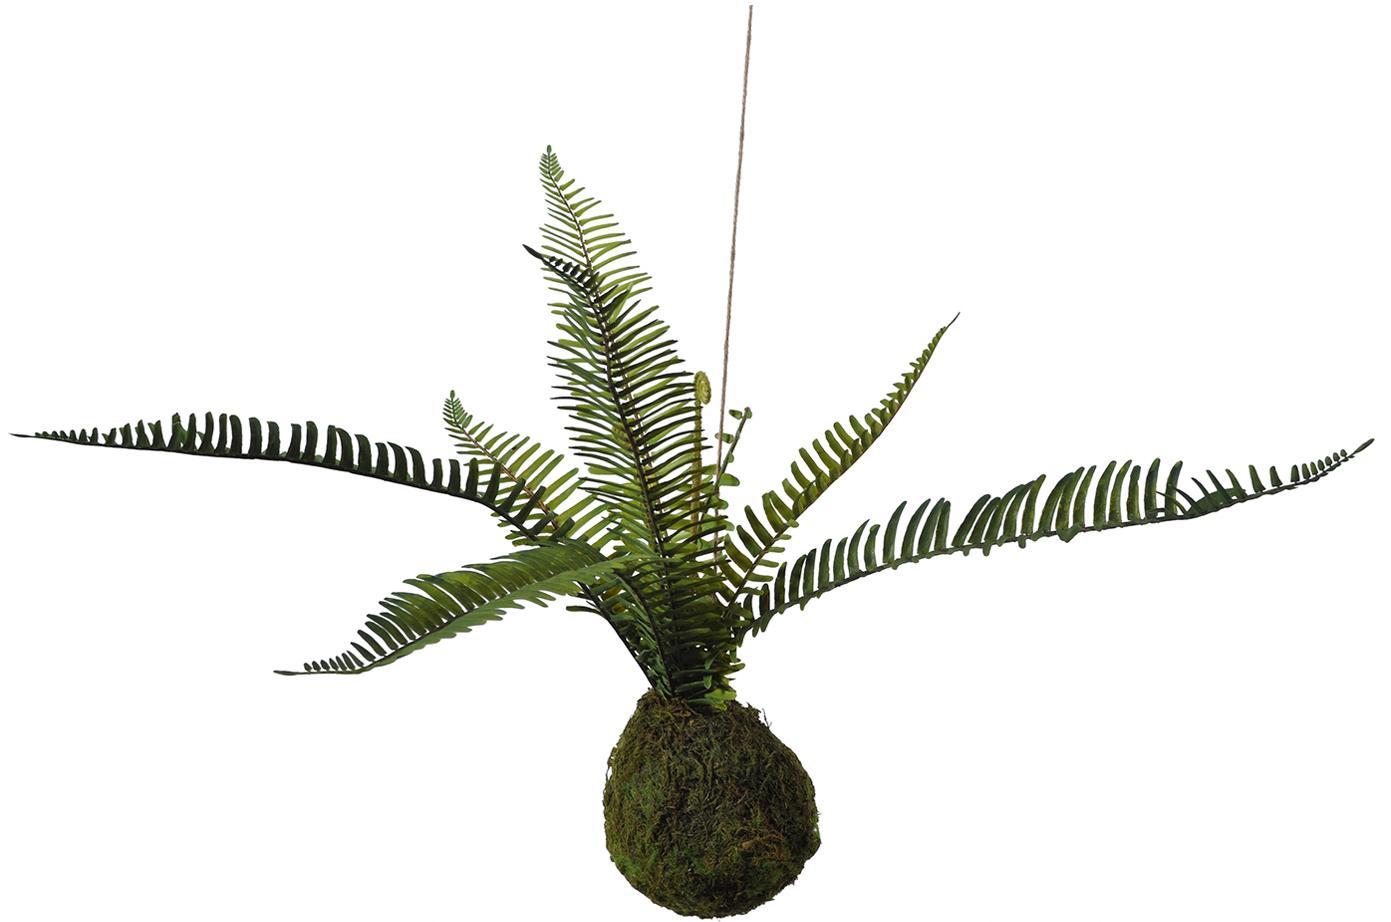 Kunstbloem Farn, Kunststof, schuimstof, polyester, watergras, sisal, metaal, Groen, bruin, H 55 cm